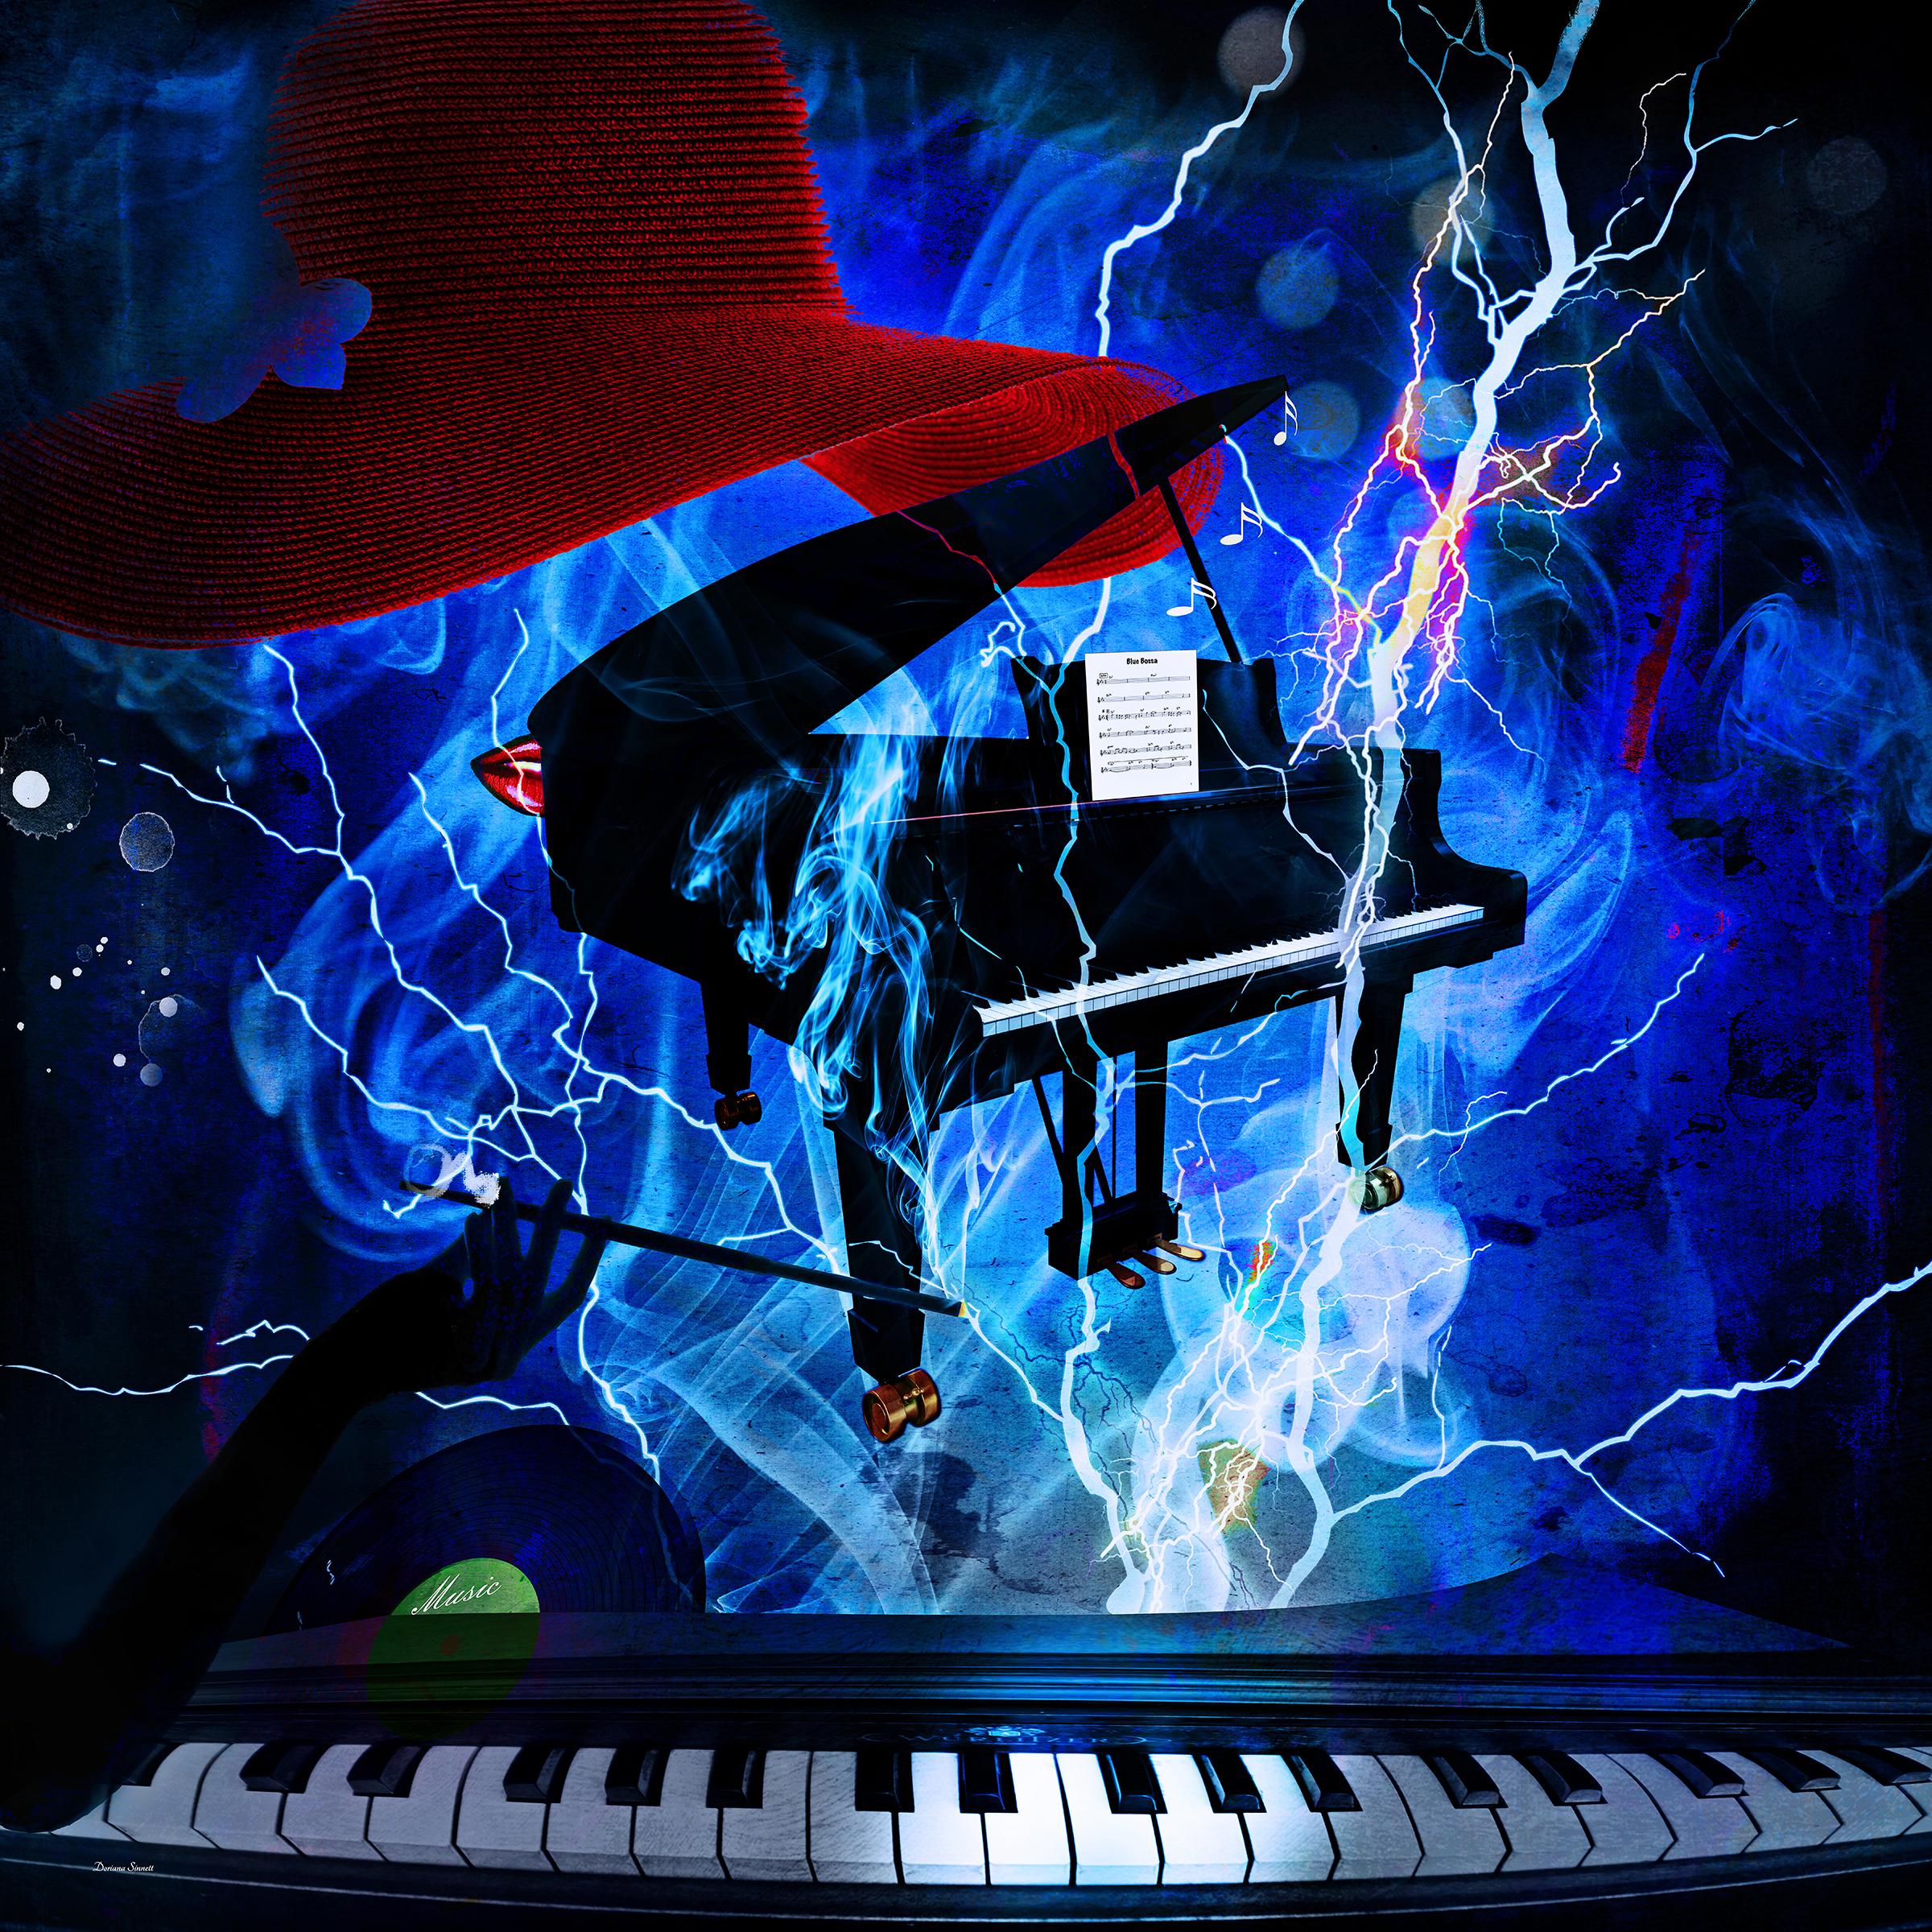 Piano Blues… Buy  https://artboja.com/art/38vvy2/22657.php